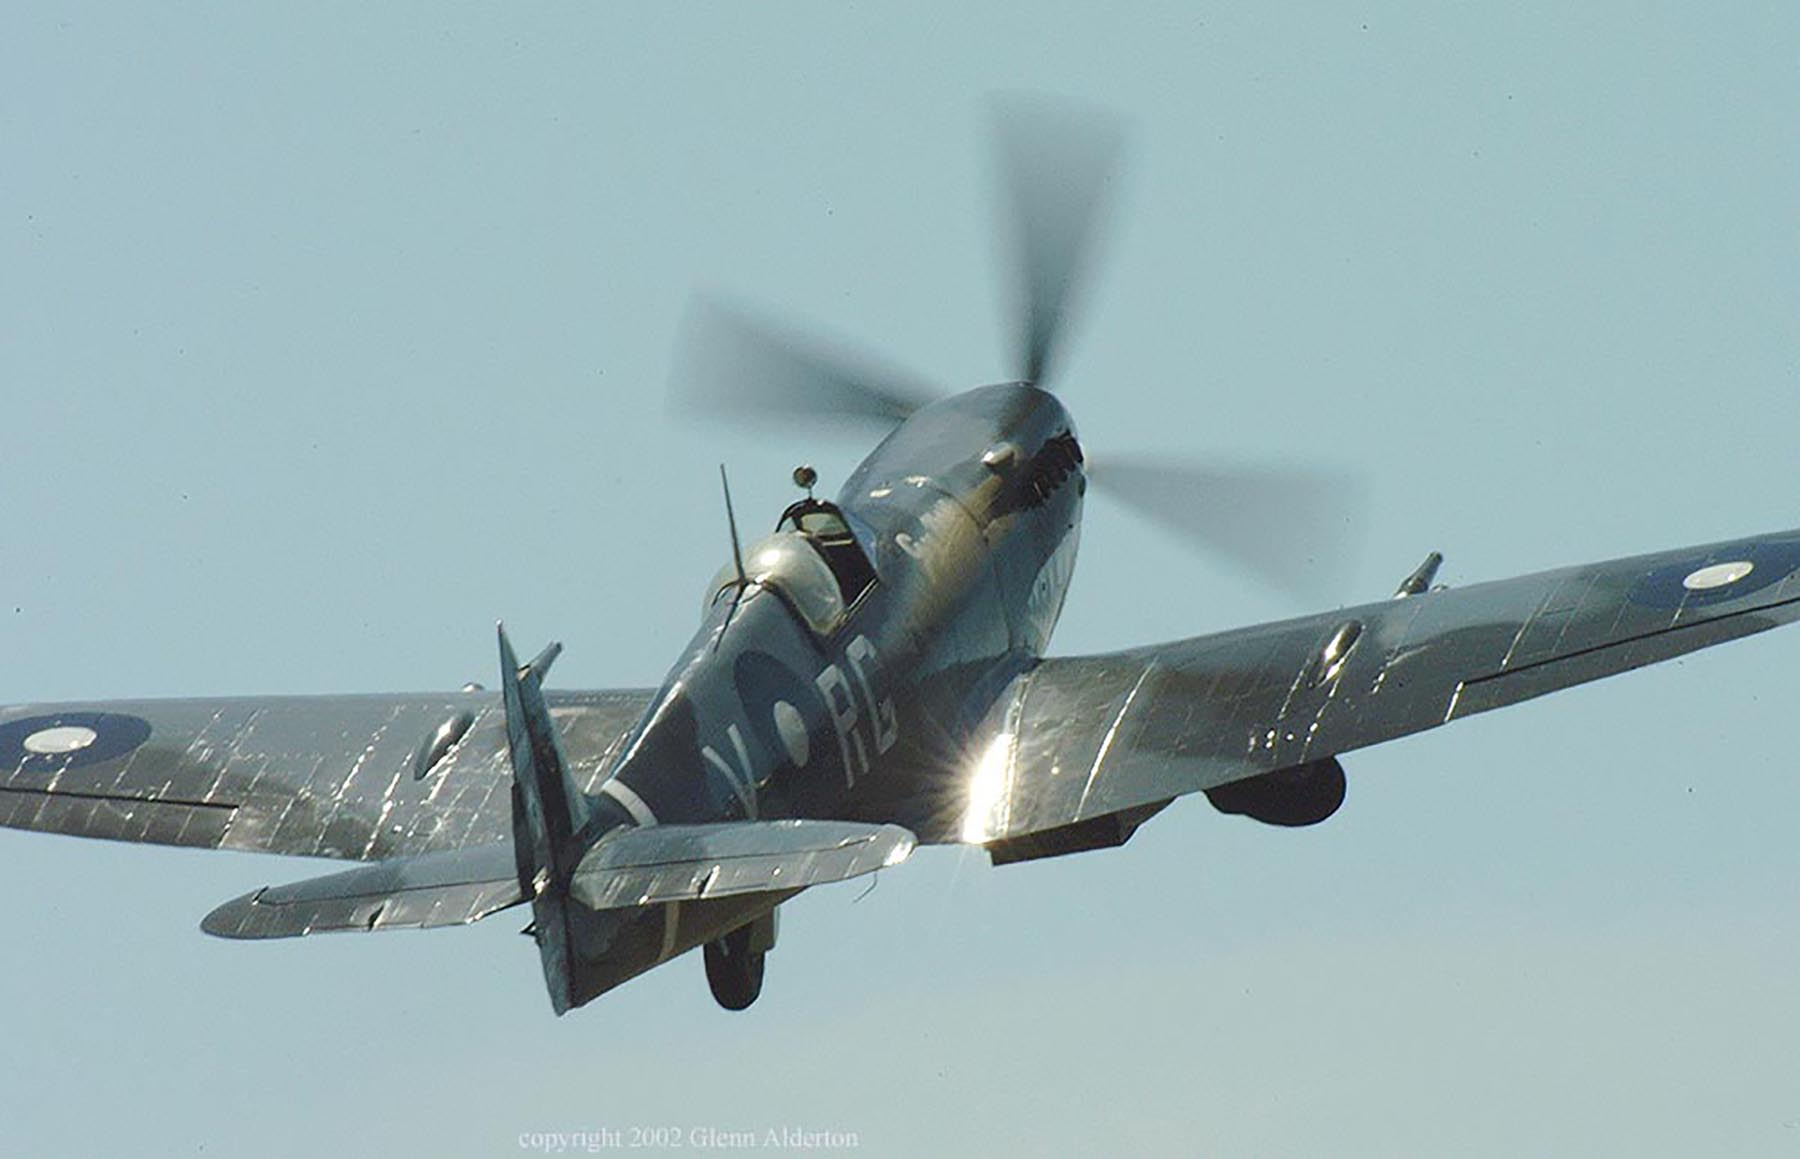 Airworthy Spitfire warbird RAAF 457Sqn RGV A58 602 02